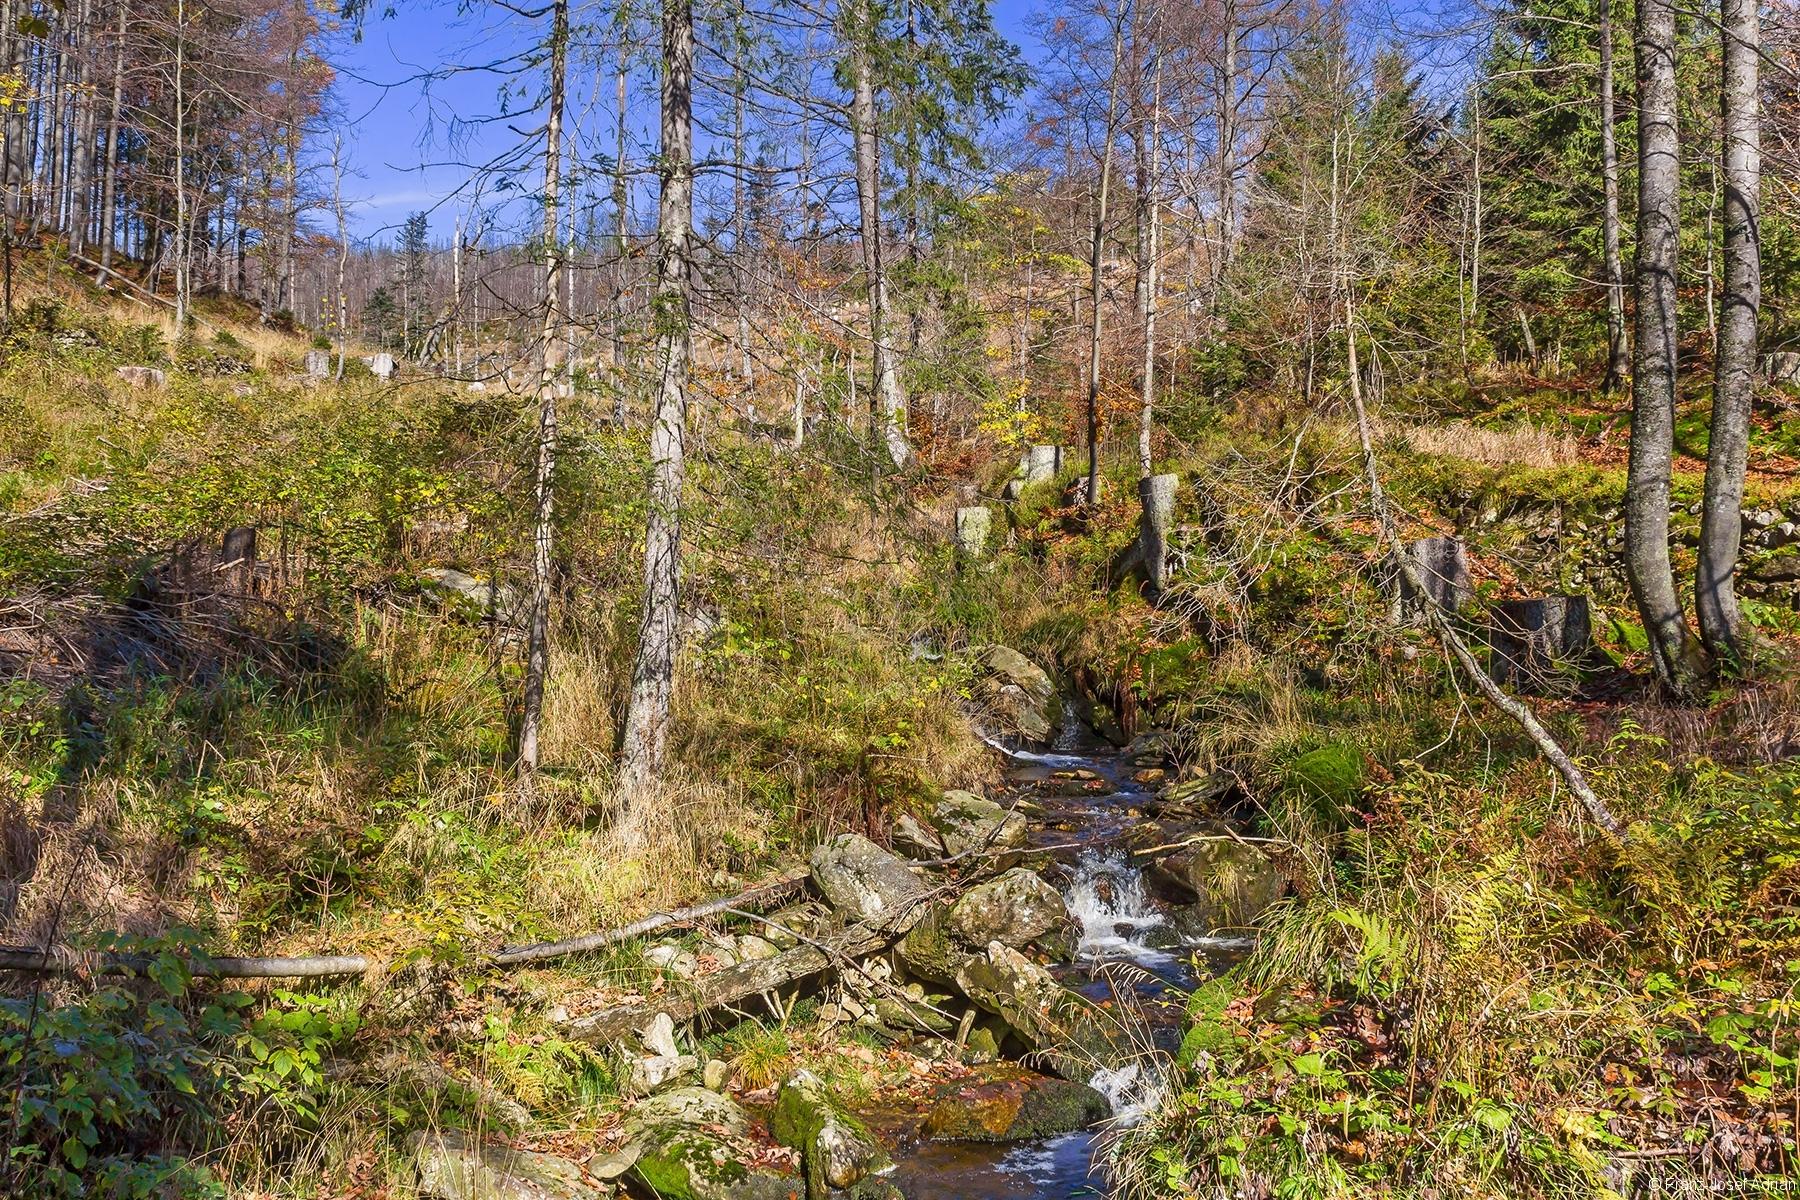 Brücke des Goldsteigs über den Rindelbach